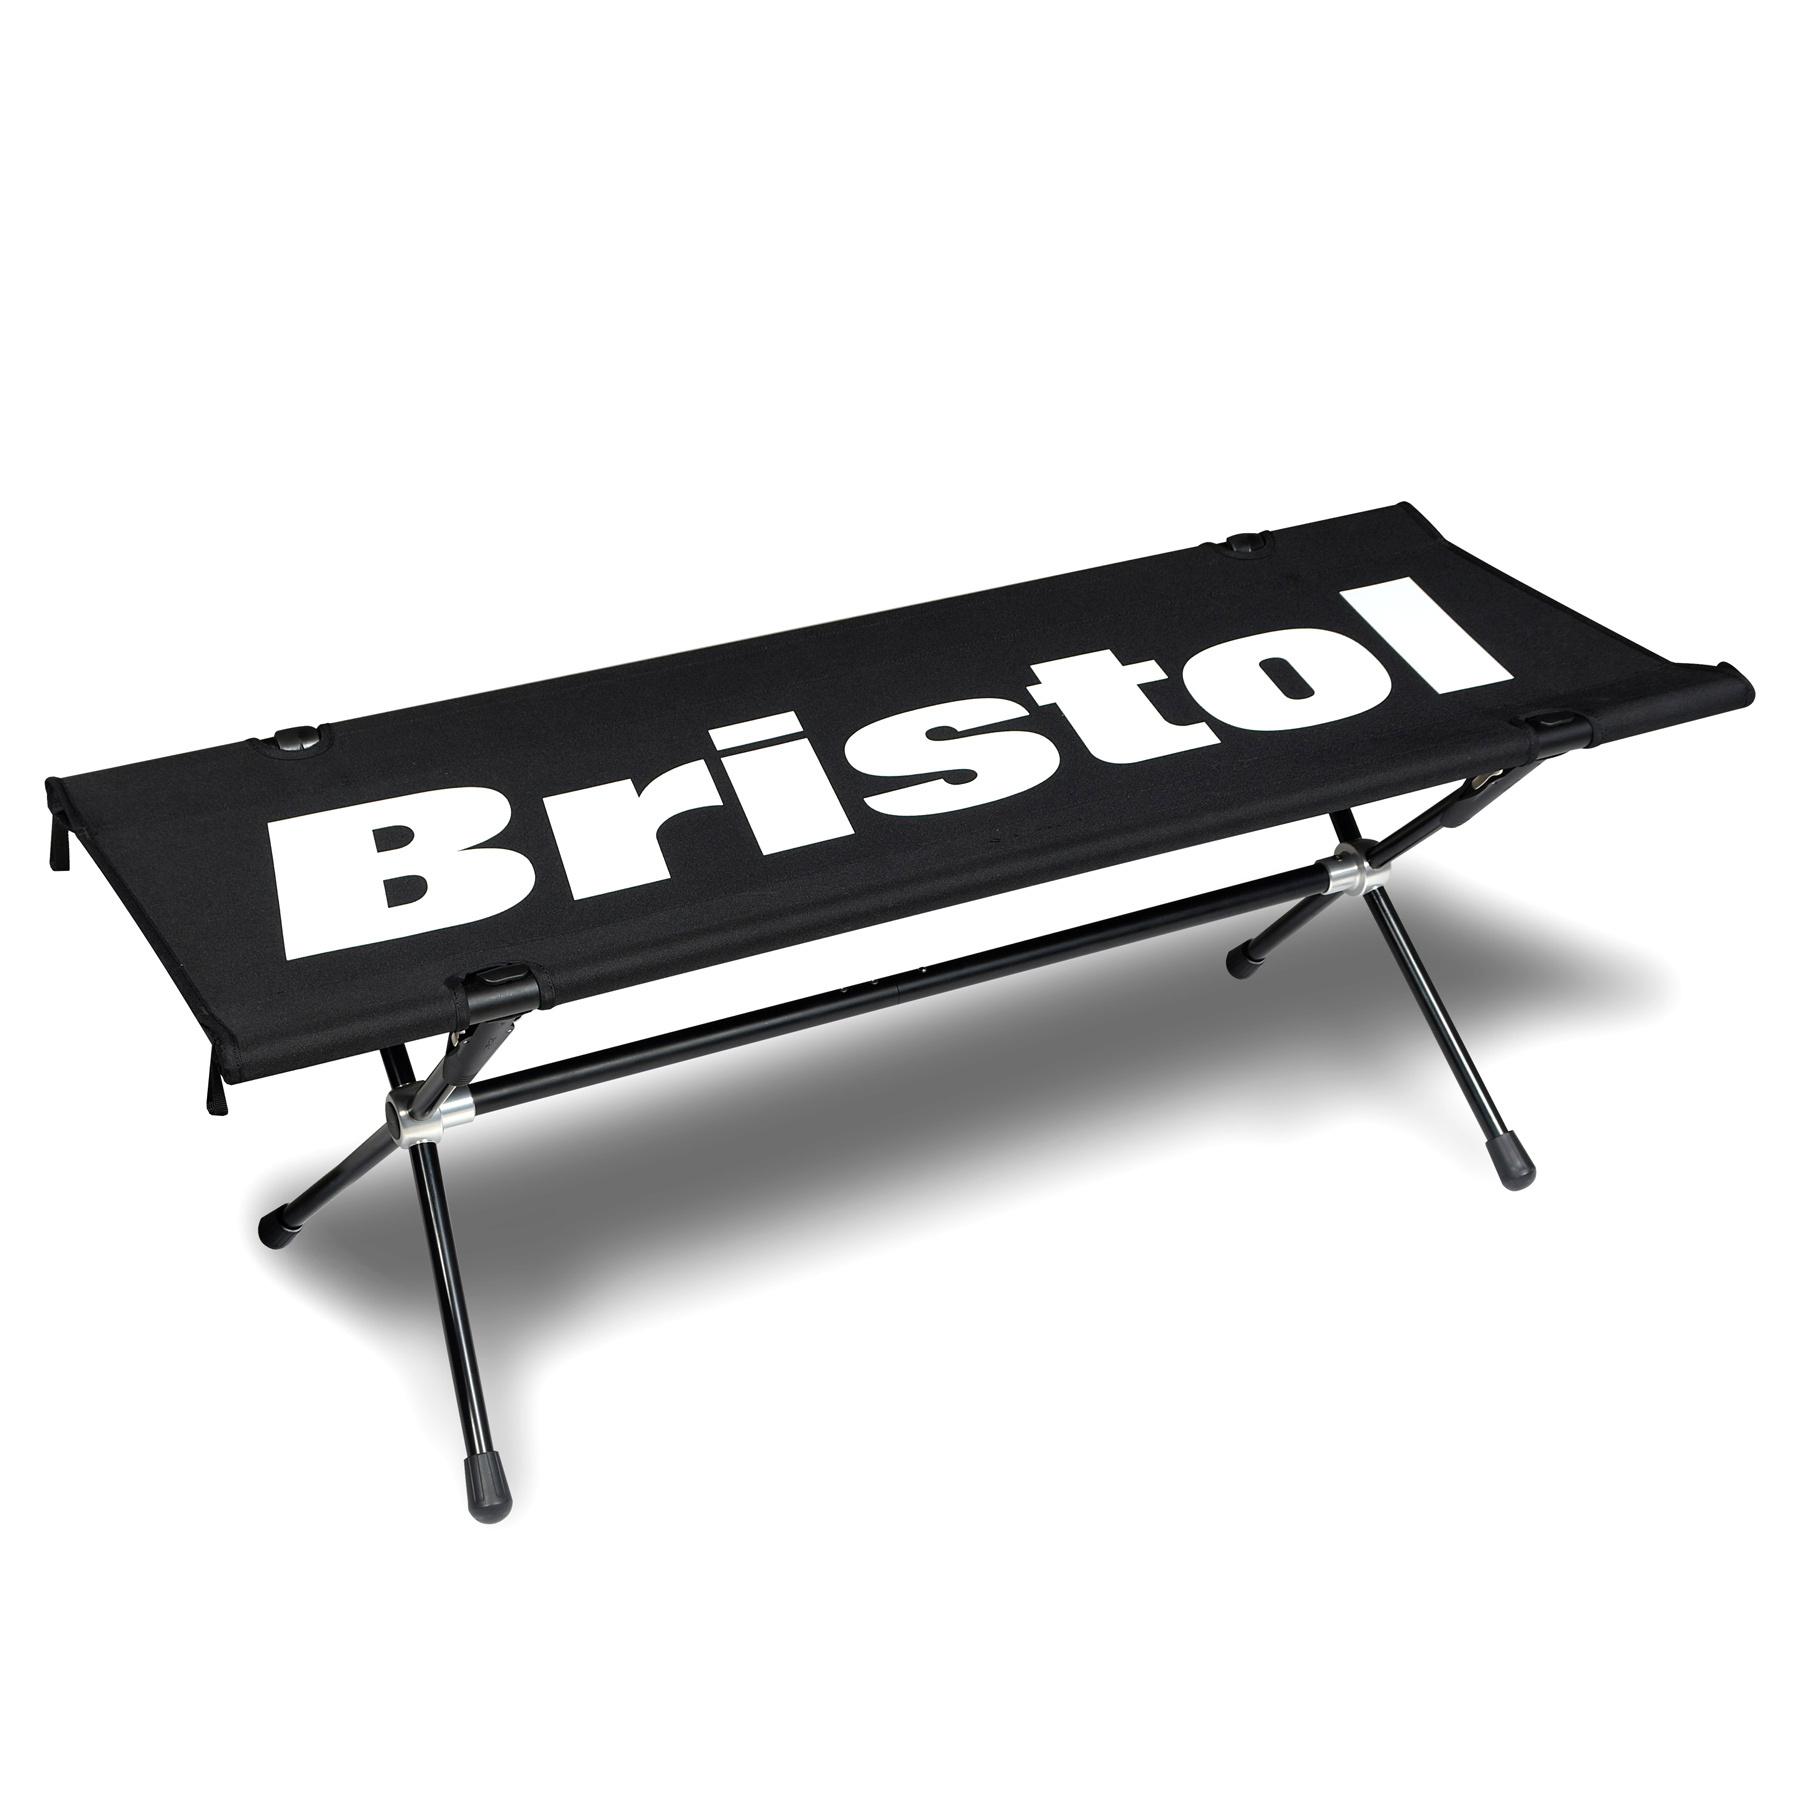 F.C.Real Bristol / HELINOX EMBLEM FOLDING BENCH